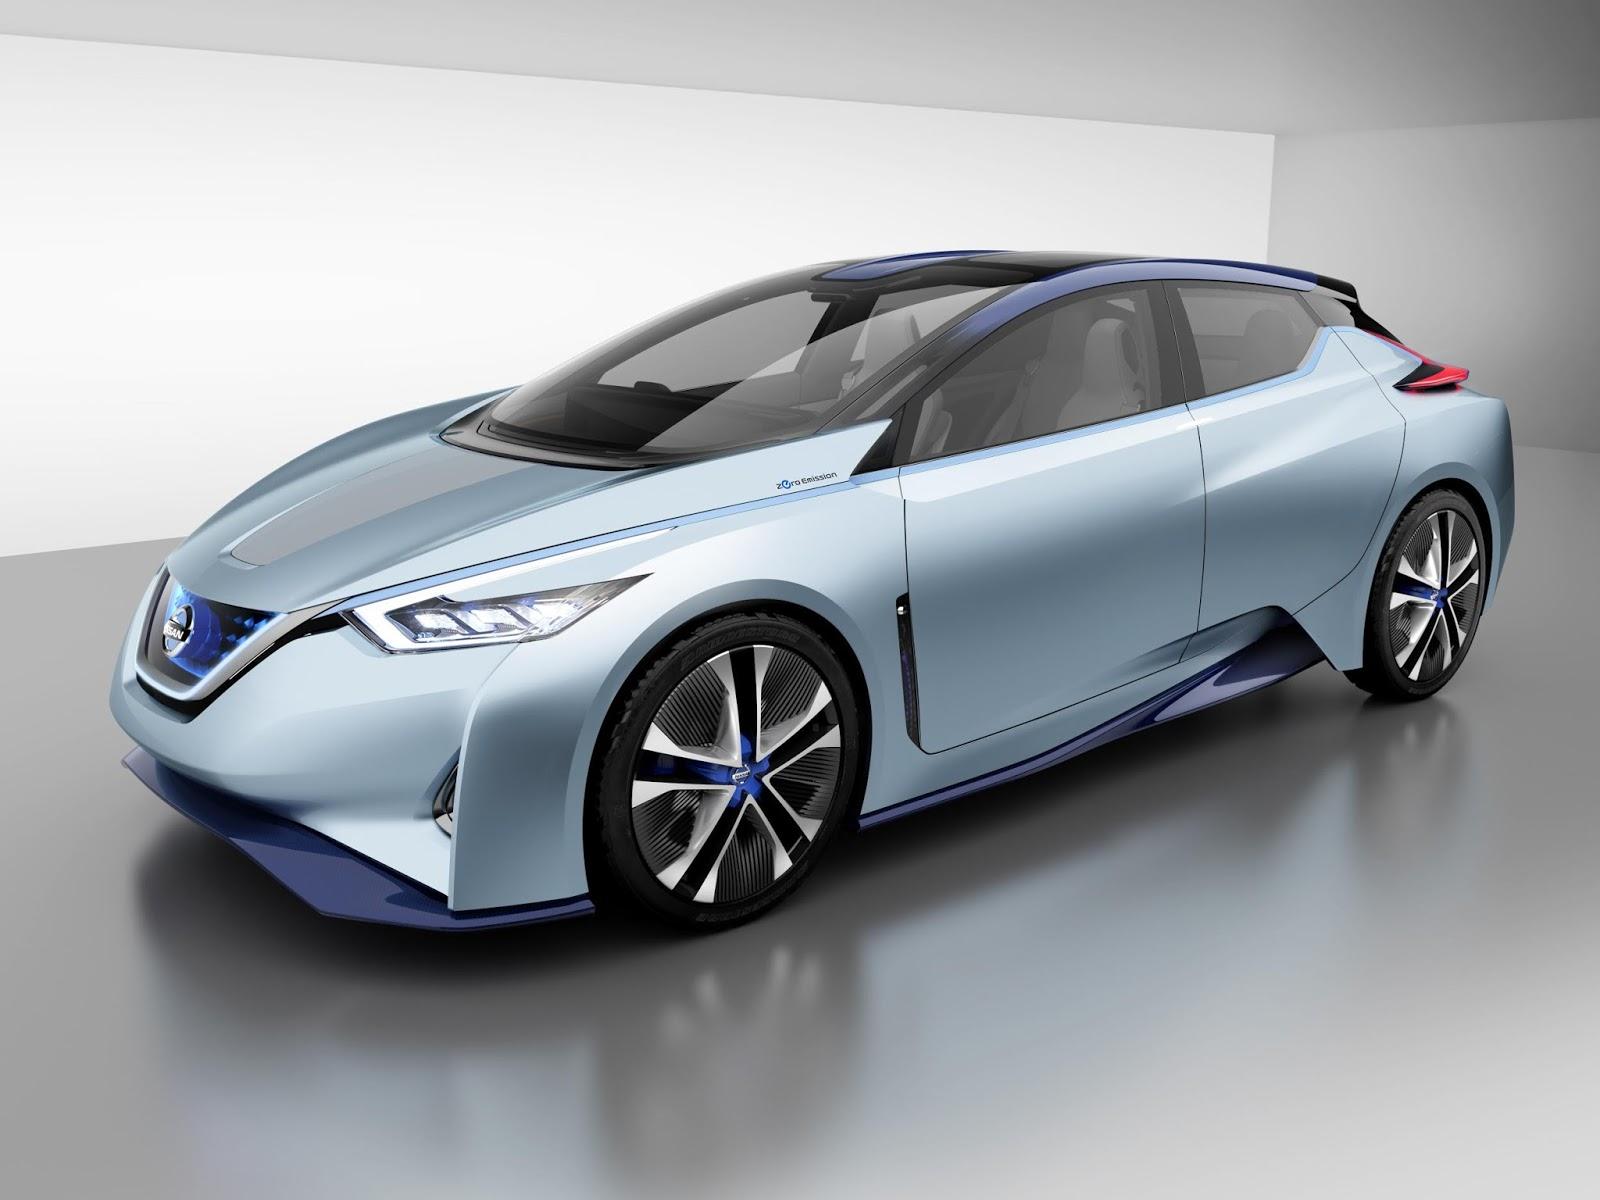 Electric Vehicle News: 2015